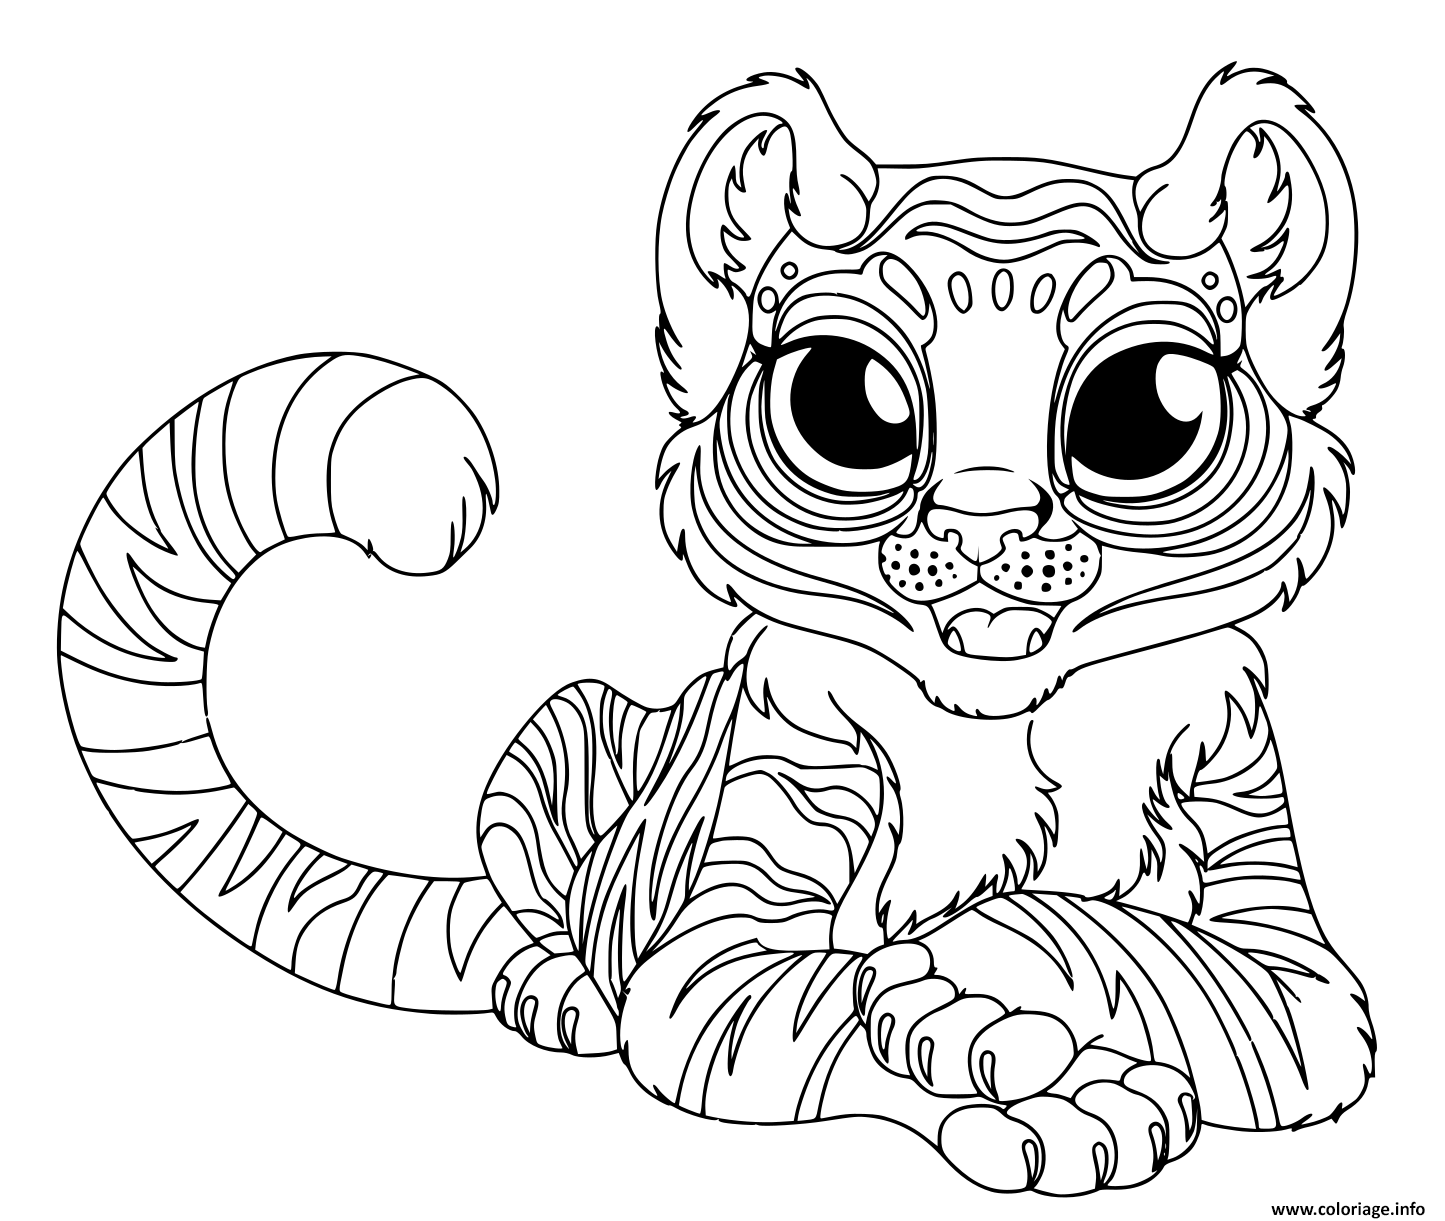 Dessin cartoon bebe tigre grand yeux Coloriage Gratuit à Imprimer